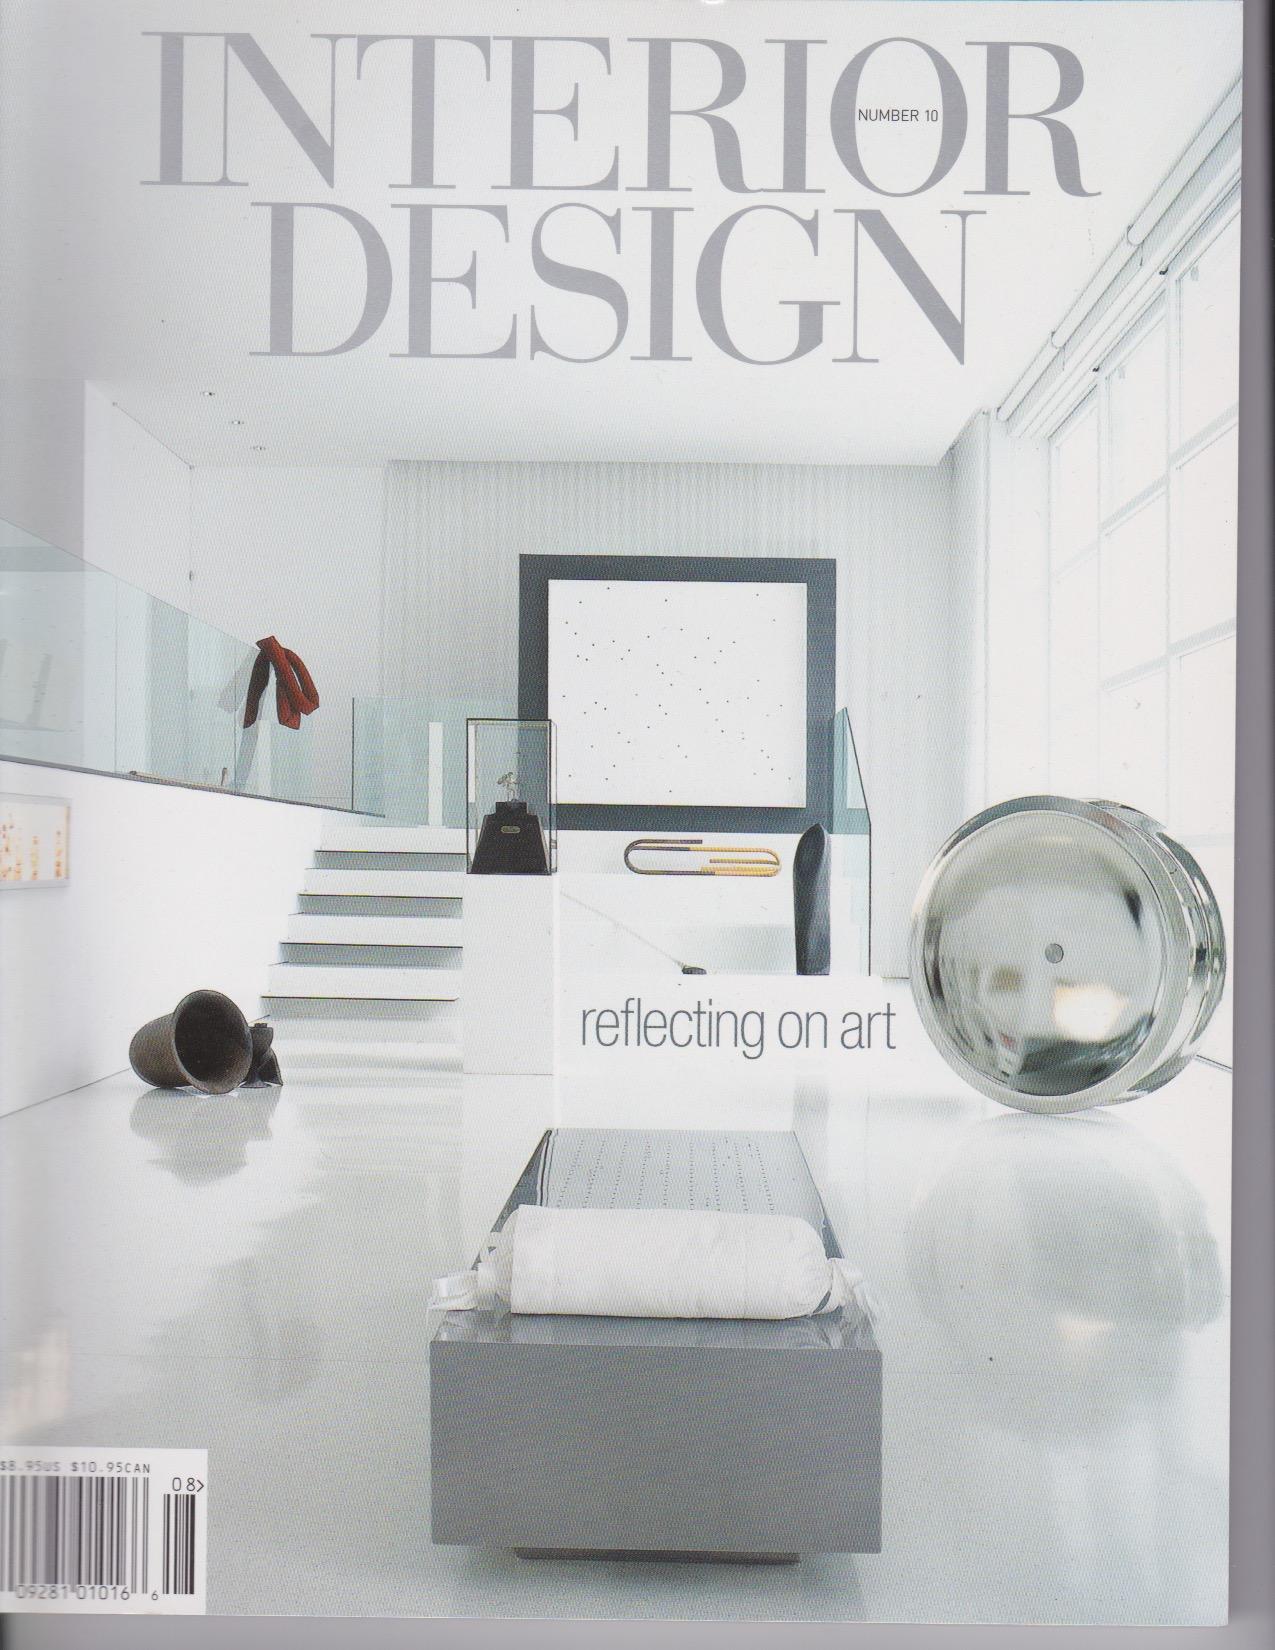 Interior Design cover.jpeg